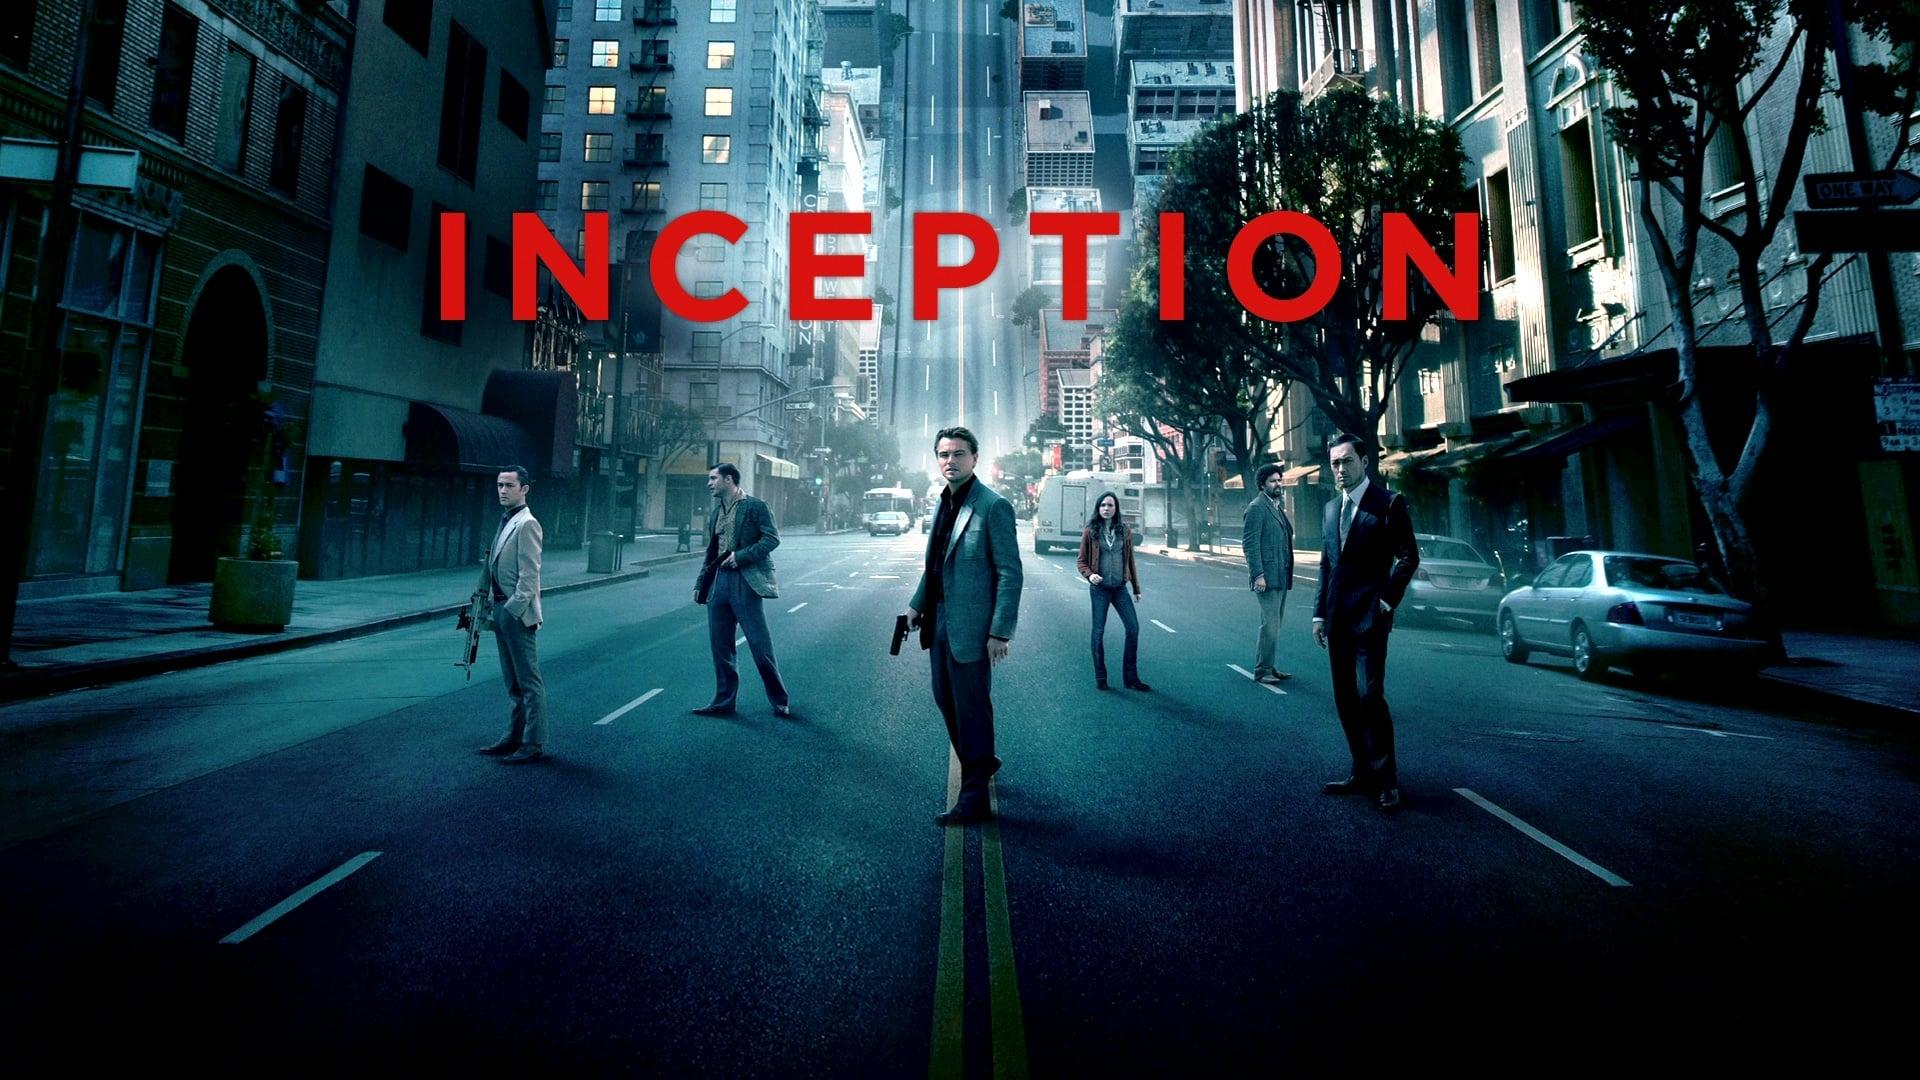 Inception (2010) - AZ Movies